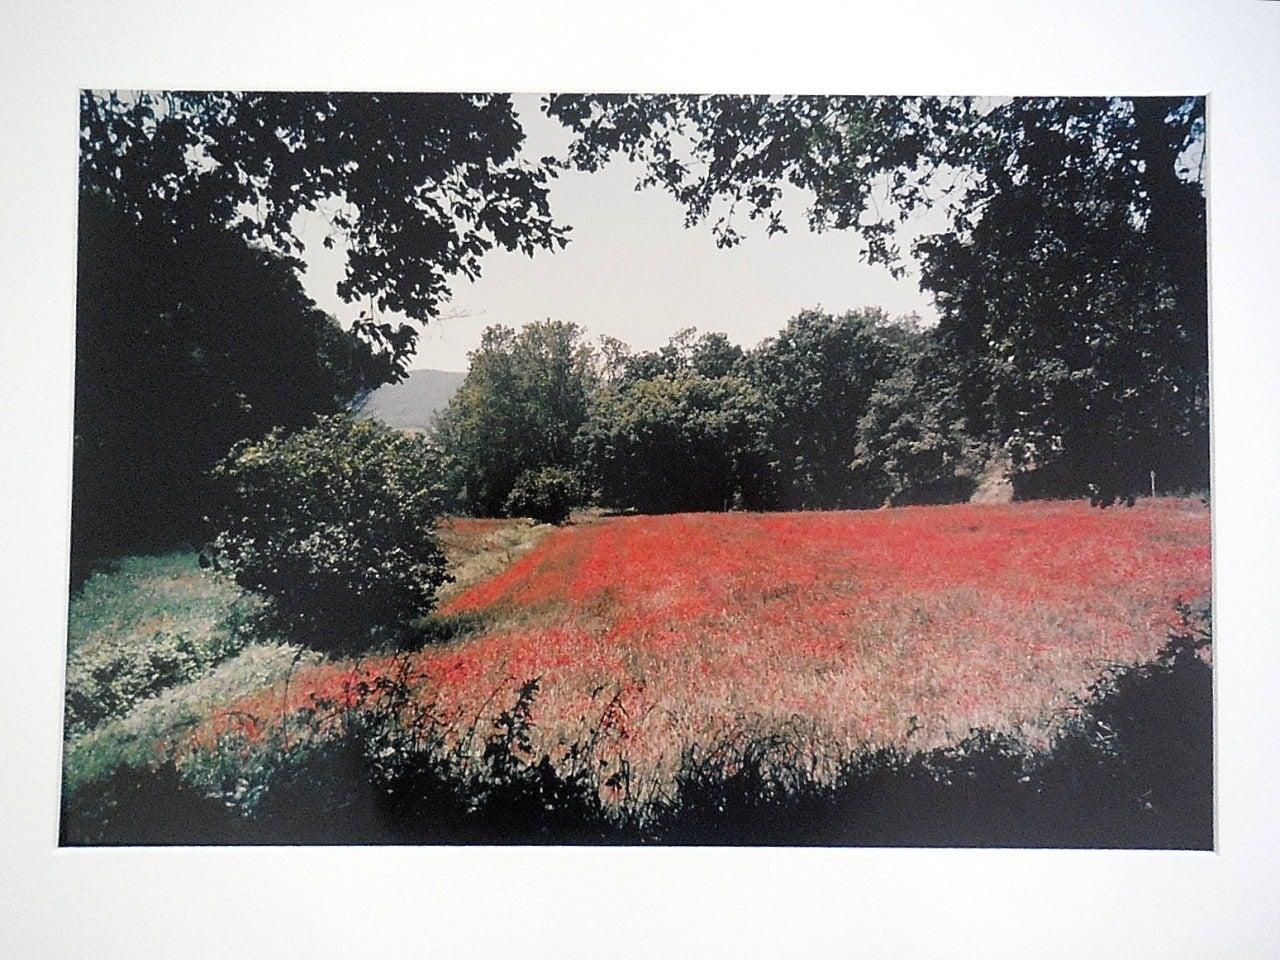 Joel Meyerowitz Landscape Photograph - Tuscany, Field of Poppies, 1996 Large Vintage Color Photograph C Print Signed